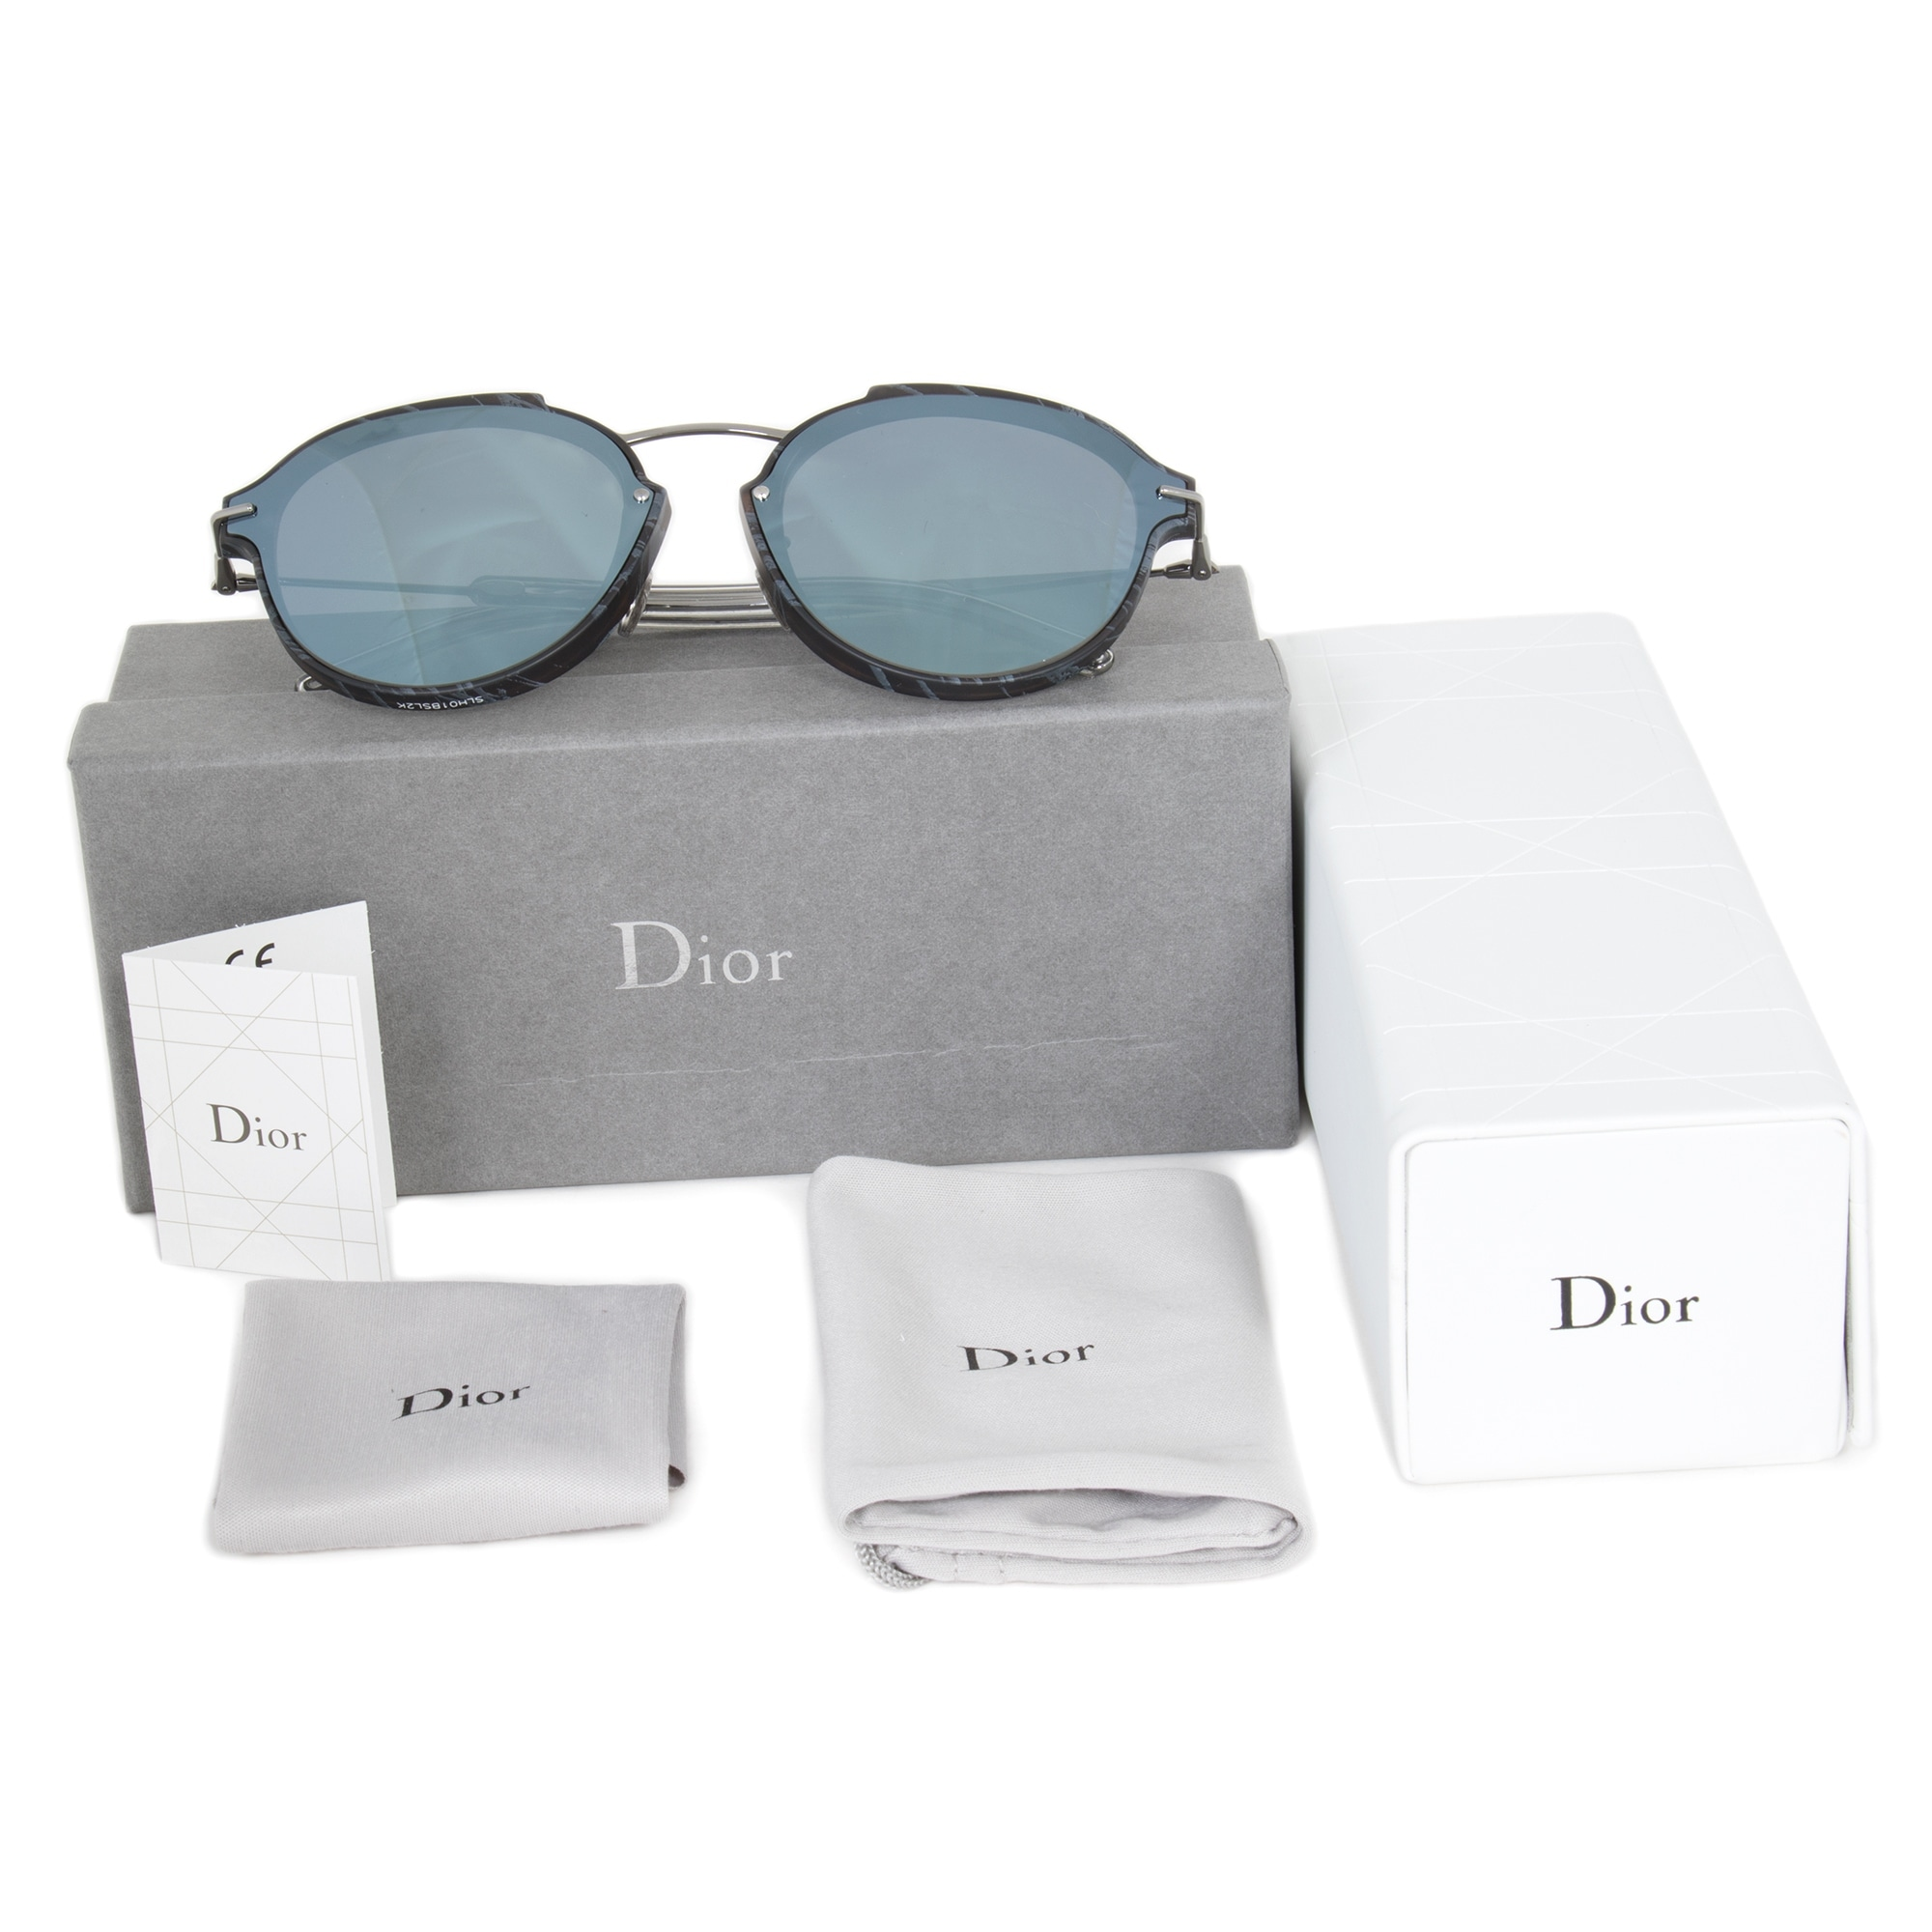 c6fca367fa Shop Christian Dior Eclat GN0T7 Sunglasses